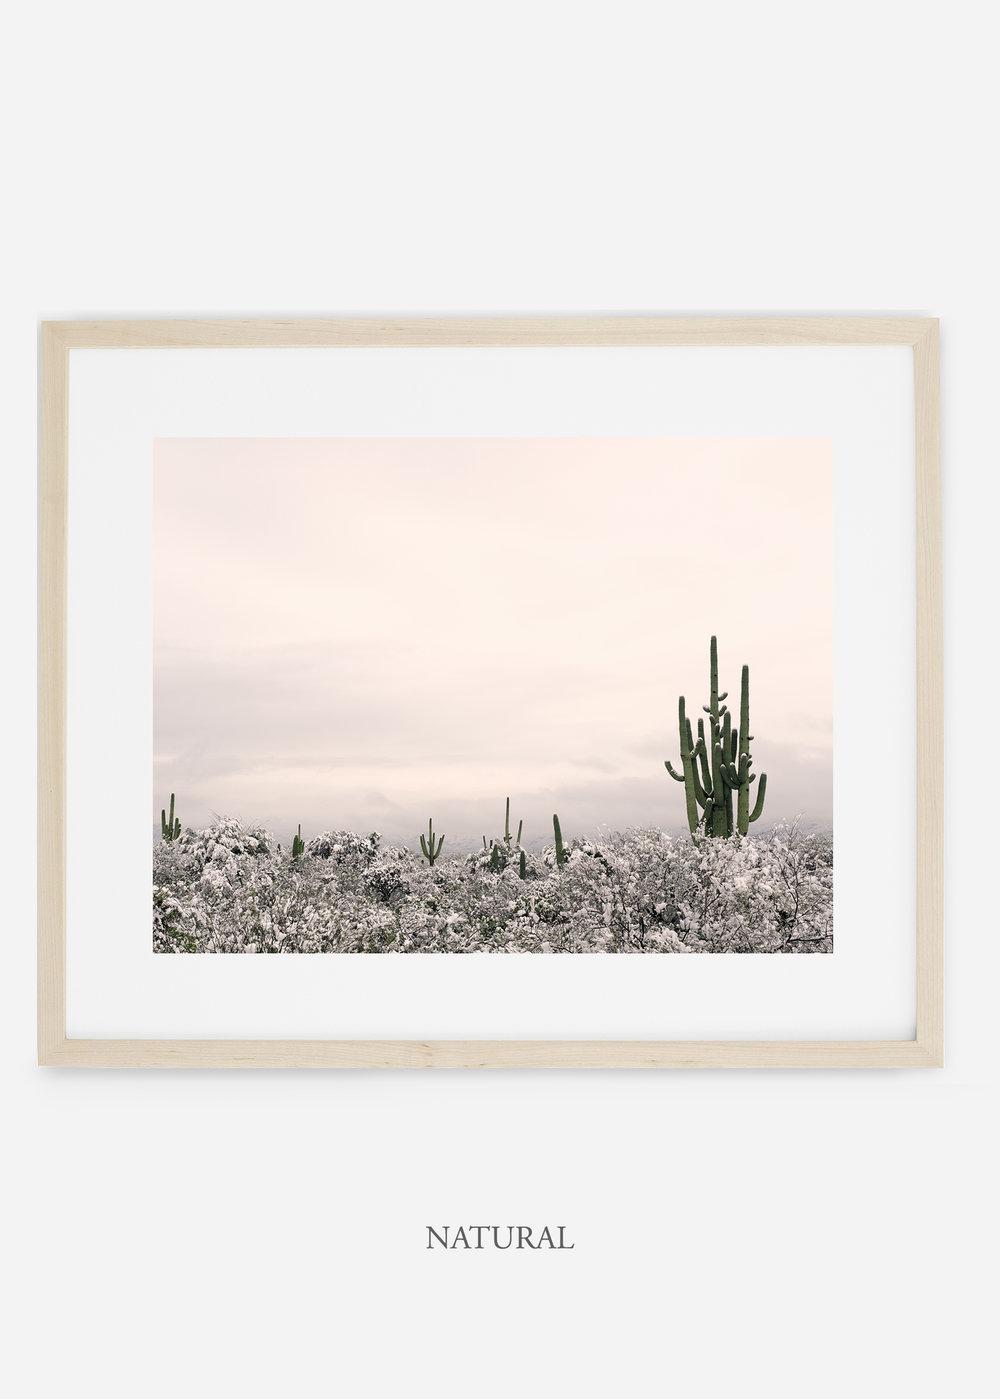 naturalframe-saguaroNo.7-wildercalifornia-art-wallart-cactusprint-homedecor-prints-arizona-botanical-artwork-interiordesign.jpg